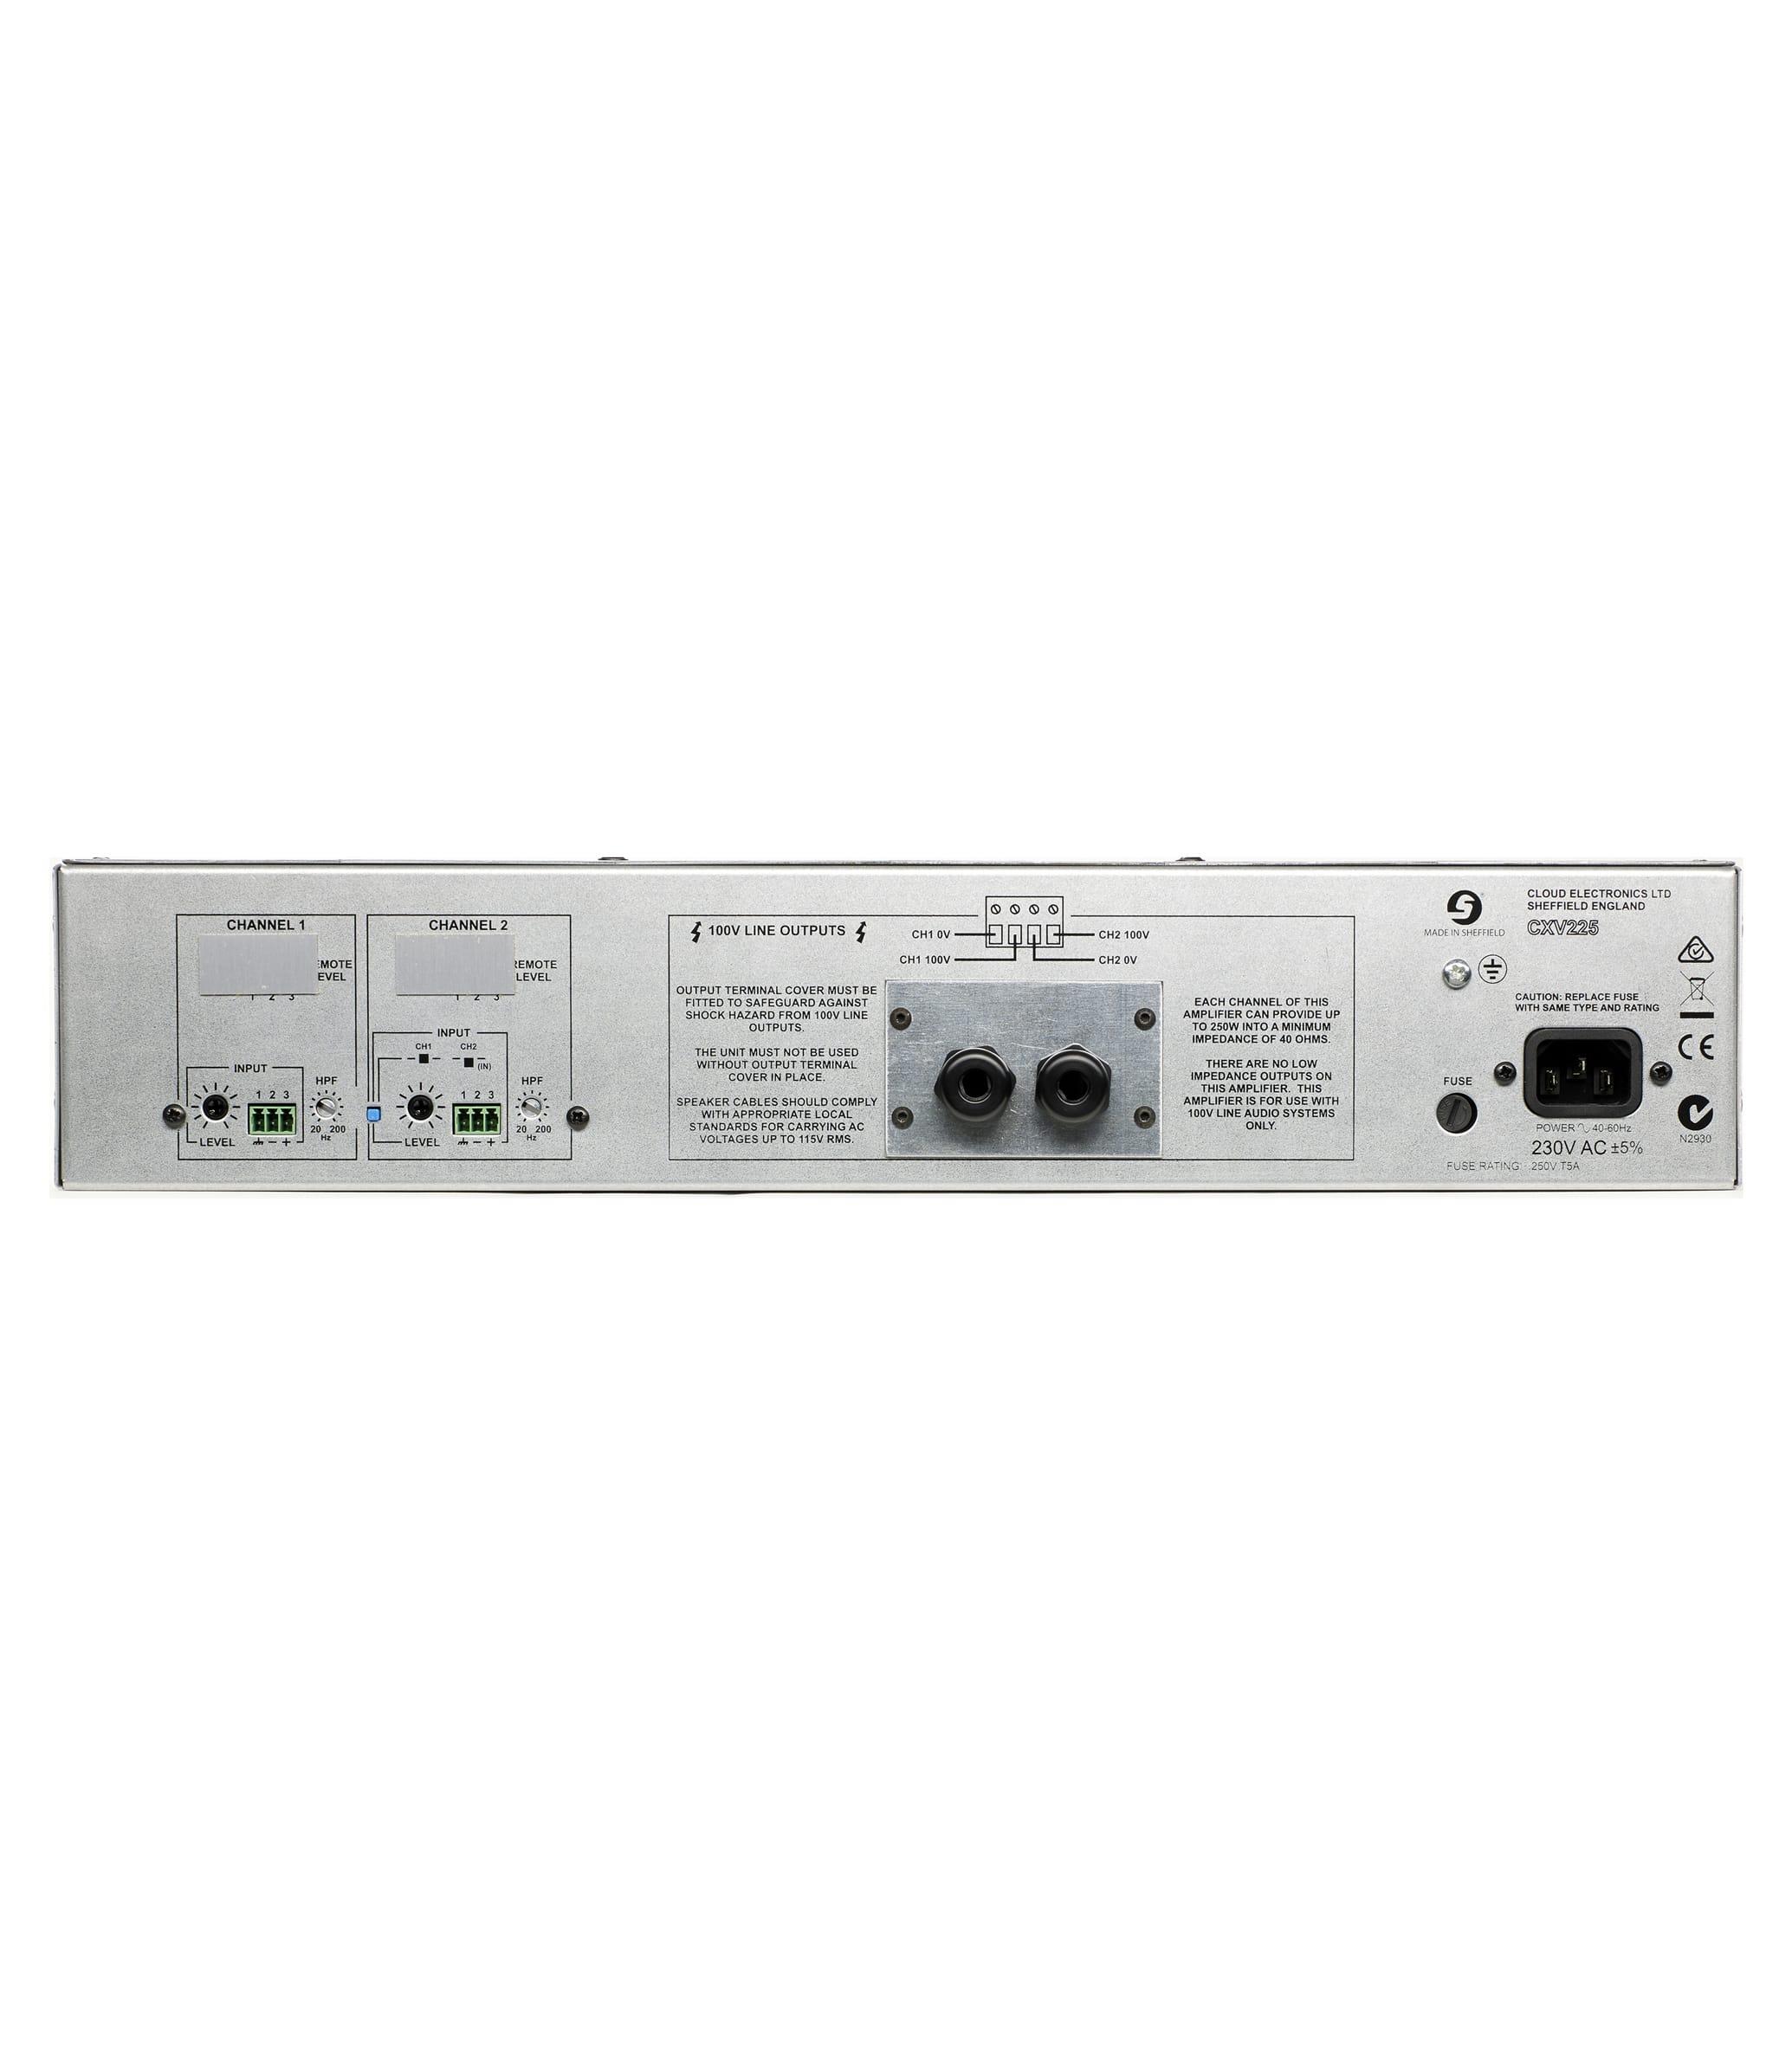 CXV225 - Buy Online